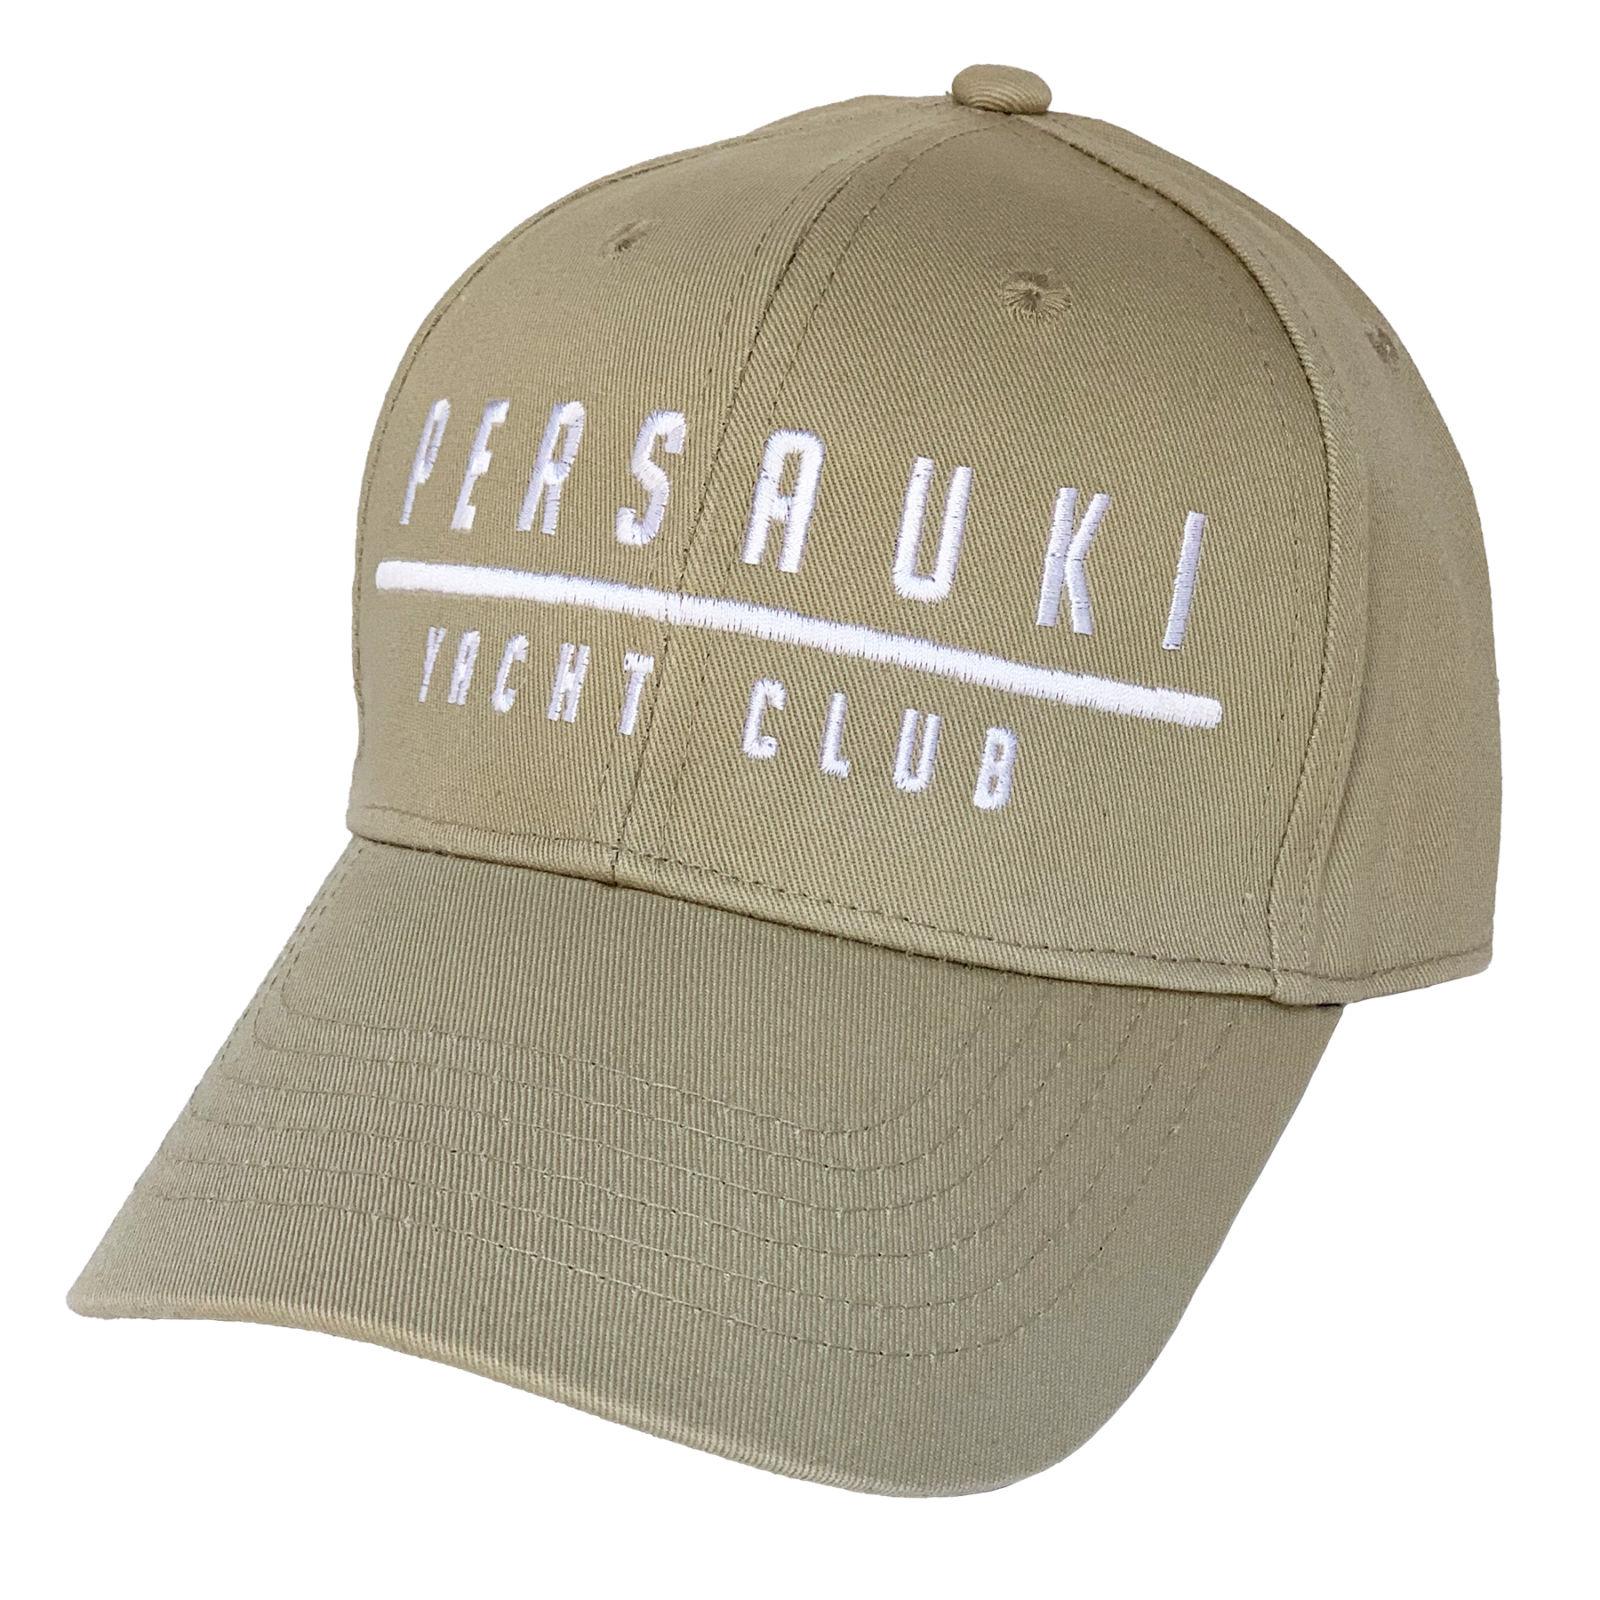 Tuotekuva: Persauki Yacht Club – Khaki lippis